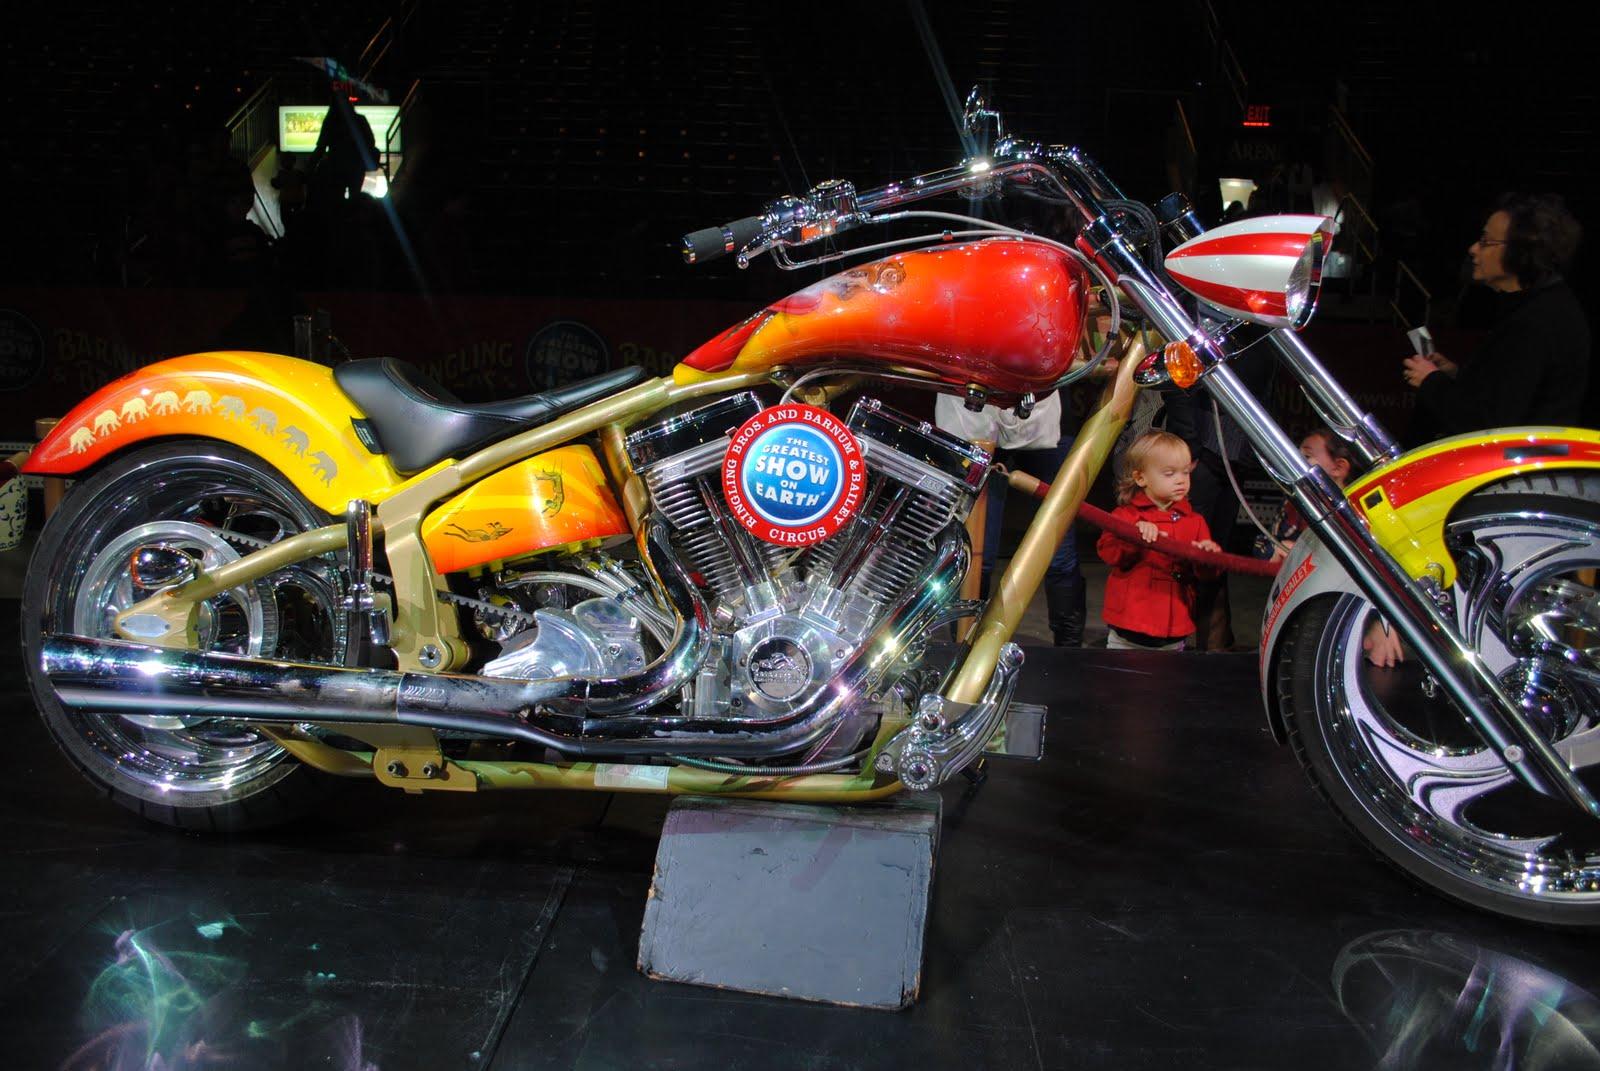 OCC+Donald+Trump+Motorcycle OCC Donald Trump Motorcycle http ...